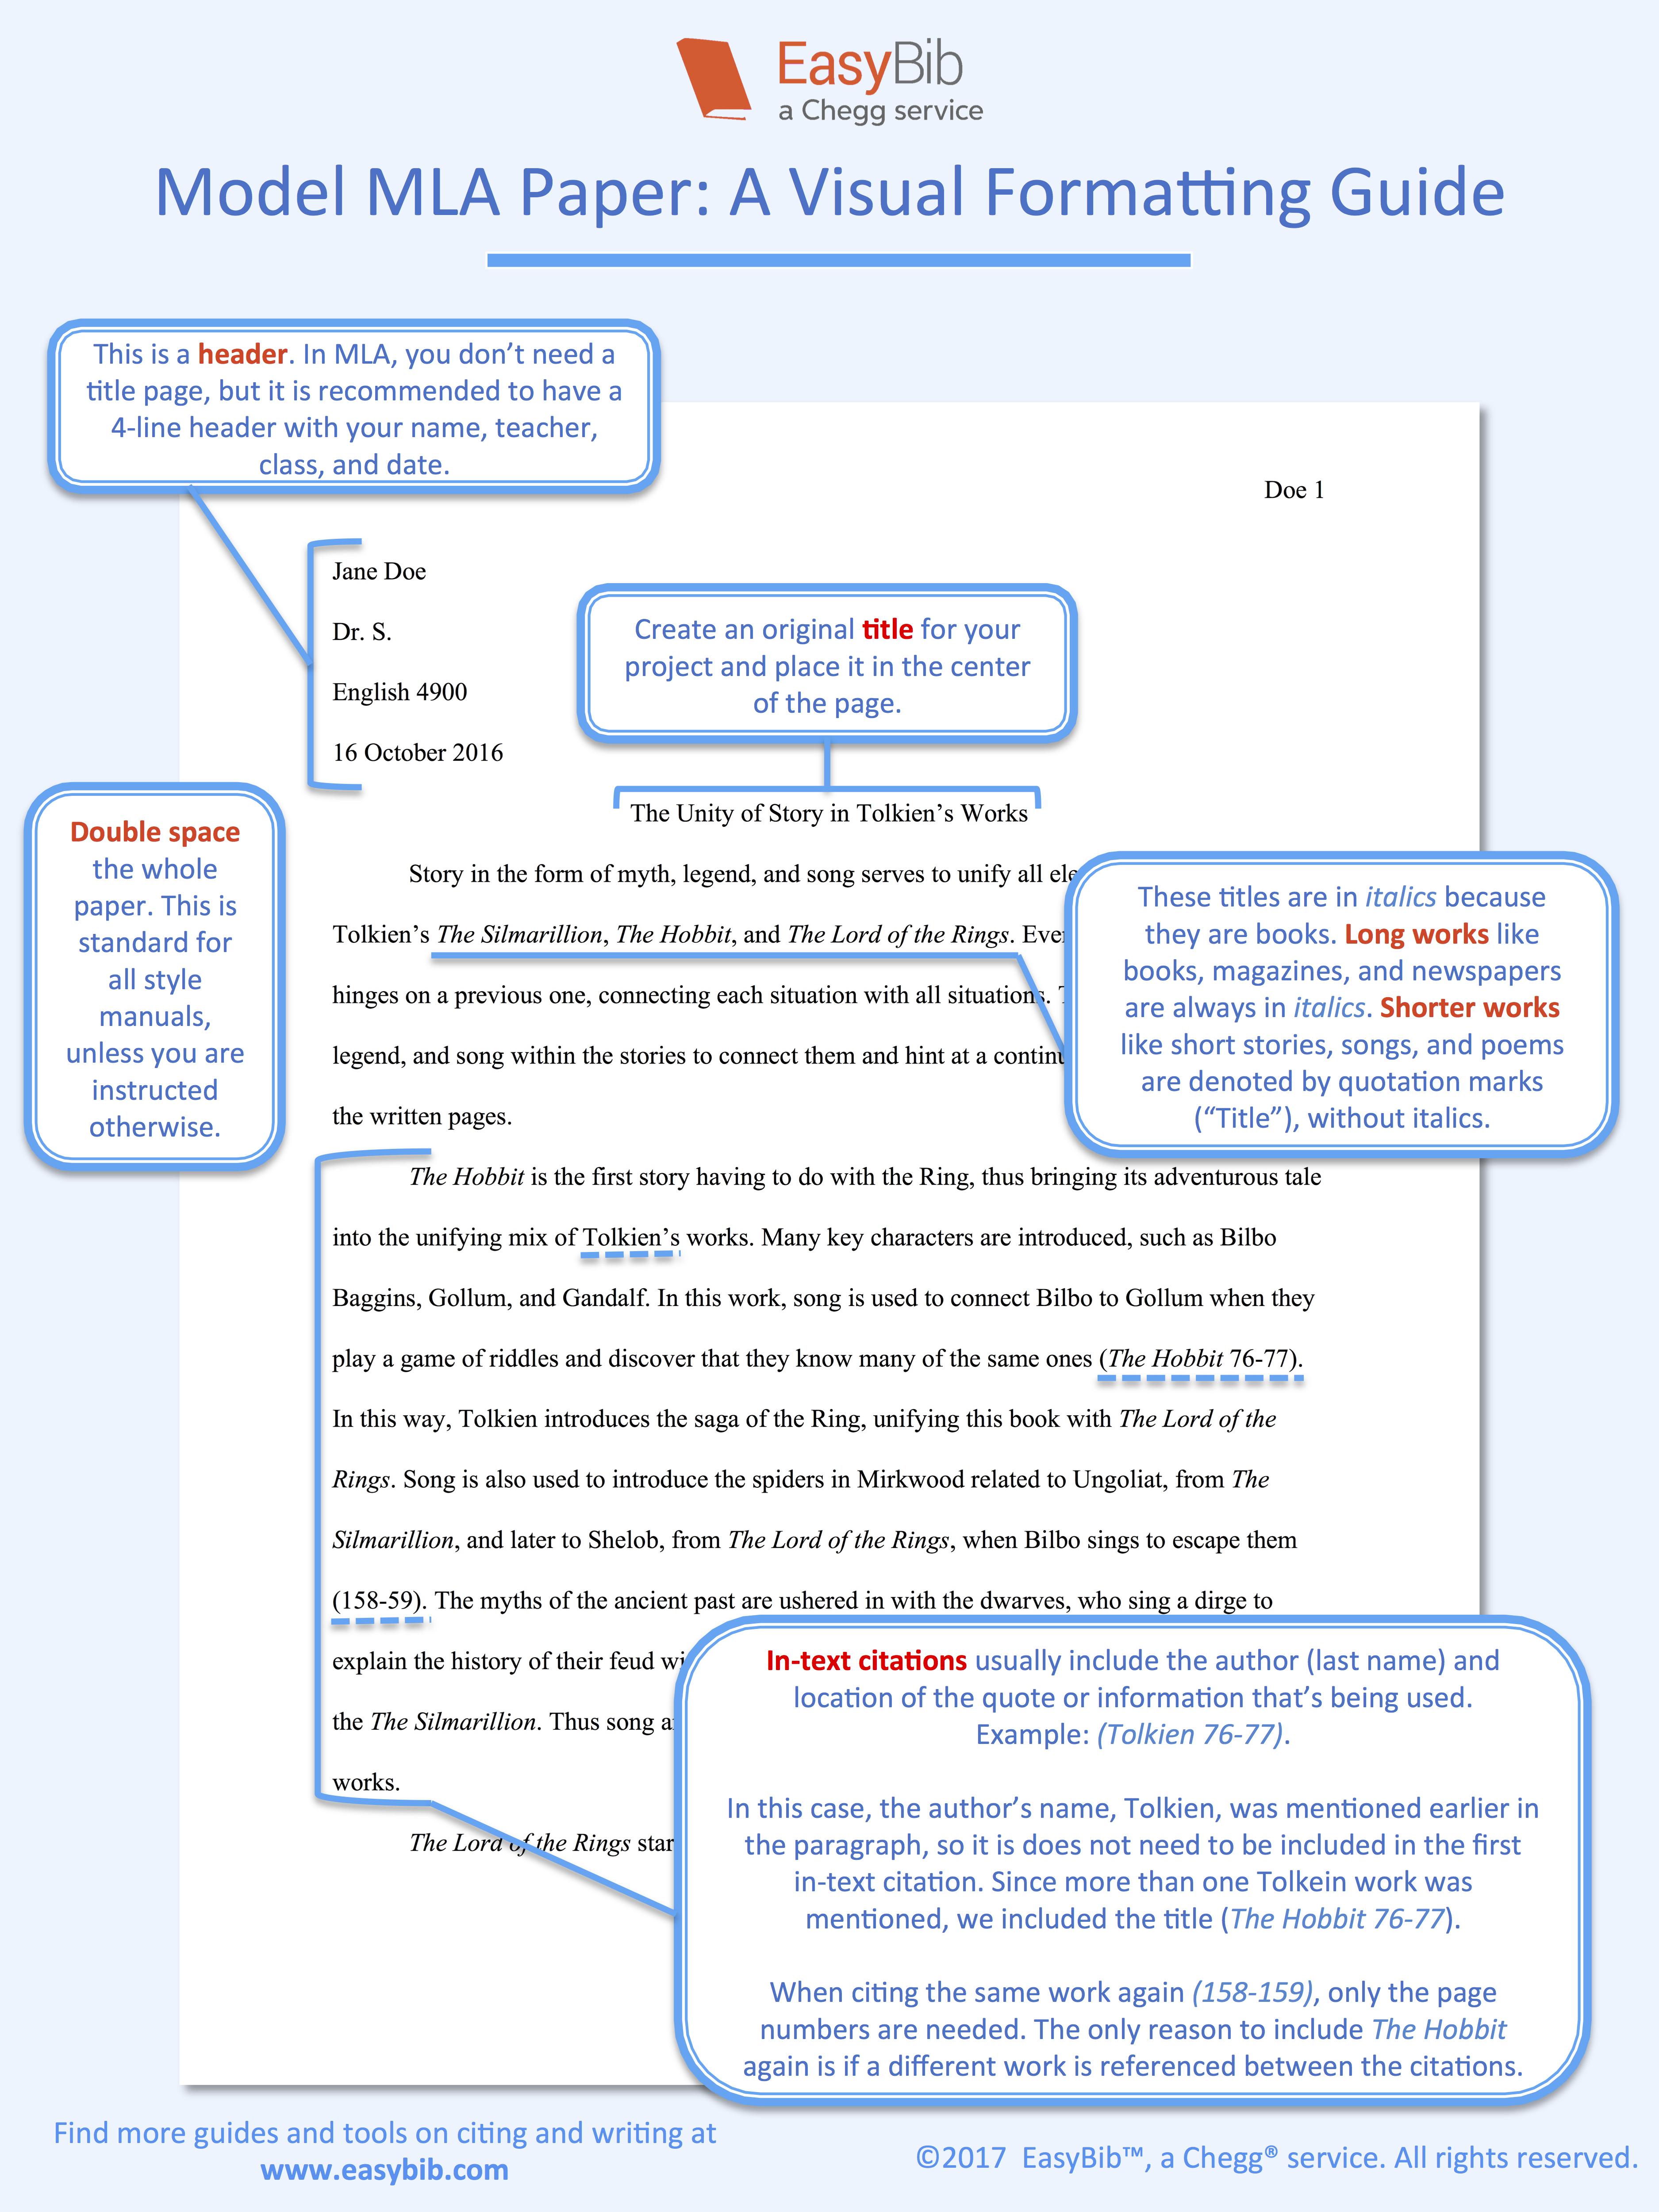 008 Essay Font Size Model Mla Paper Stunning Format College Apa Full